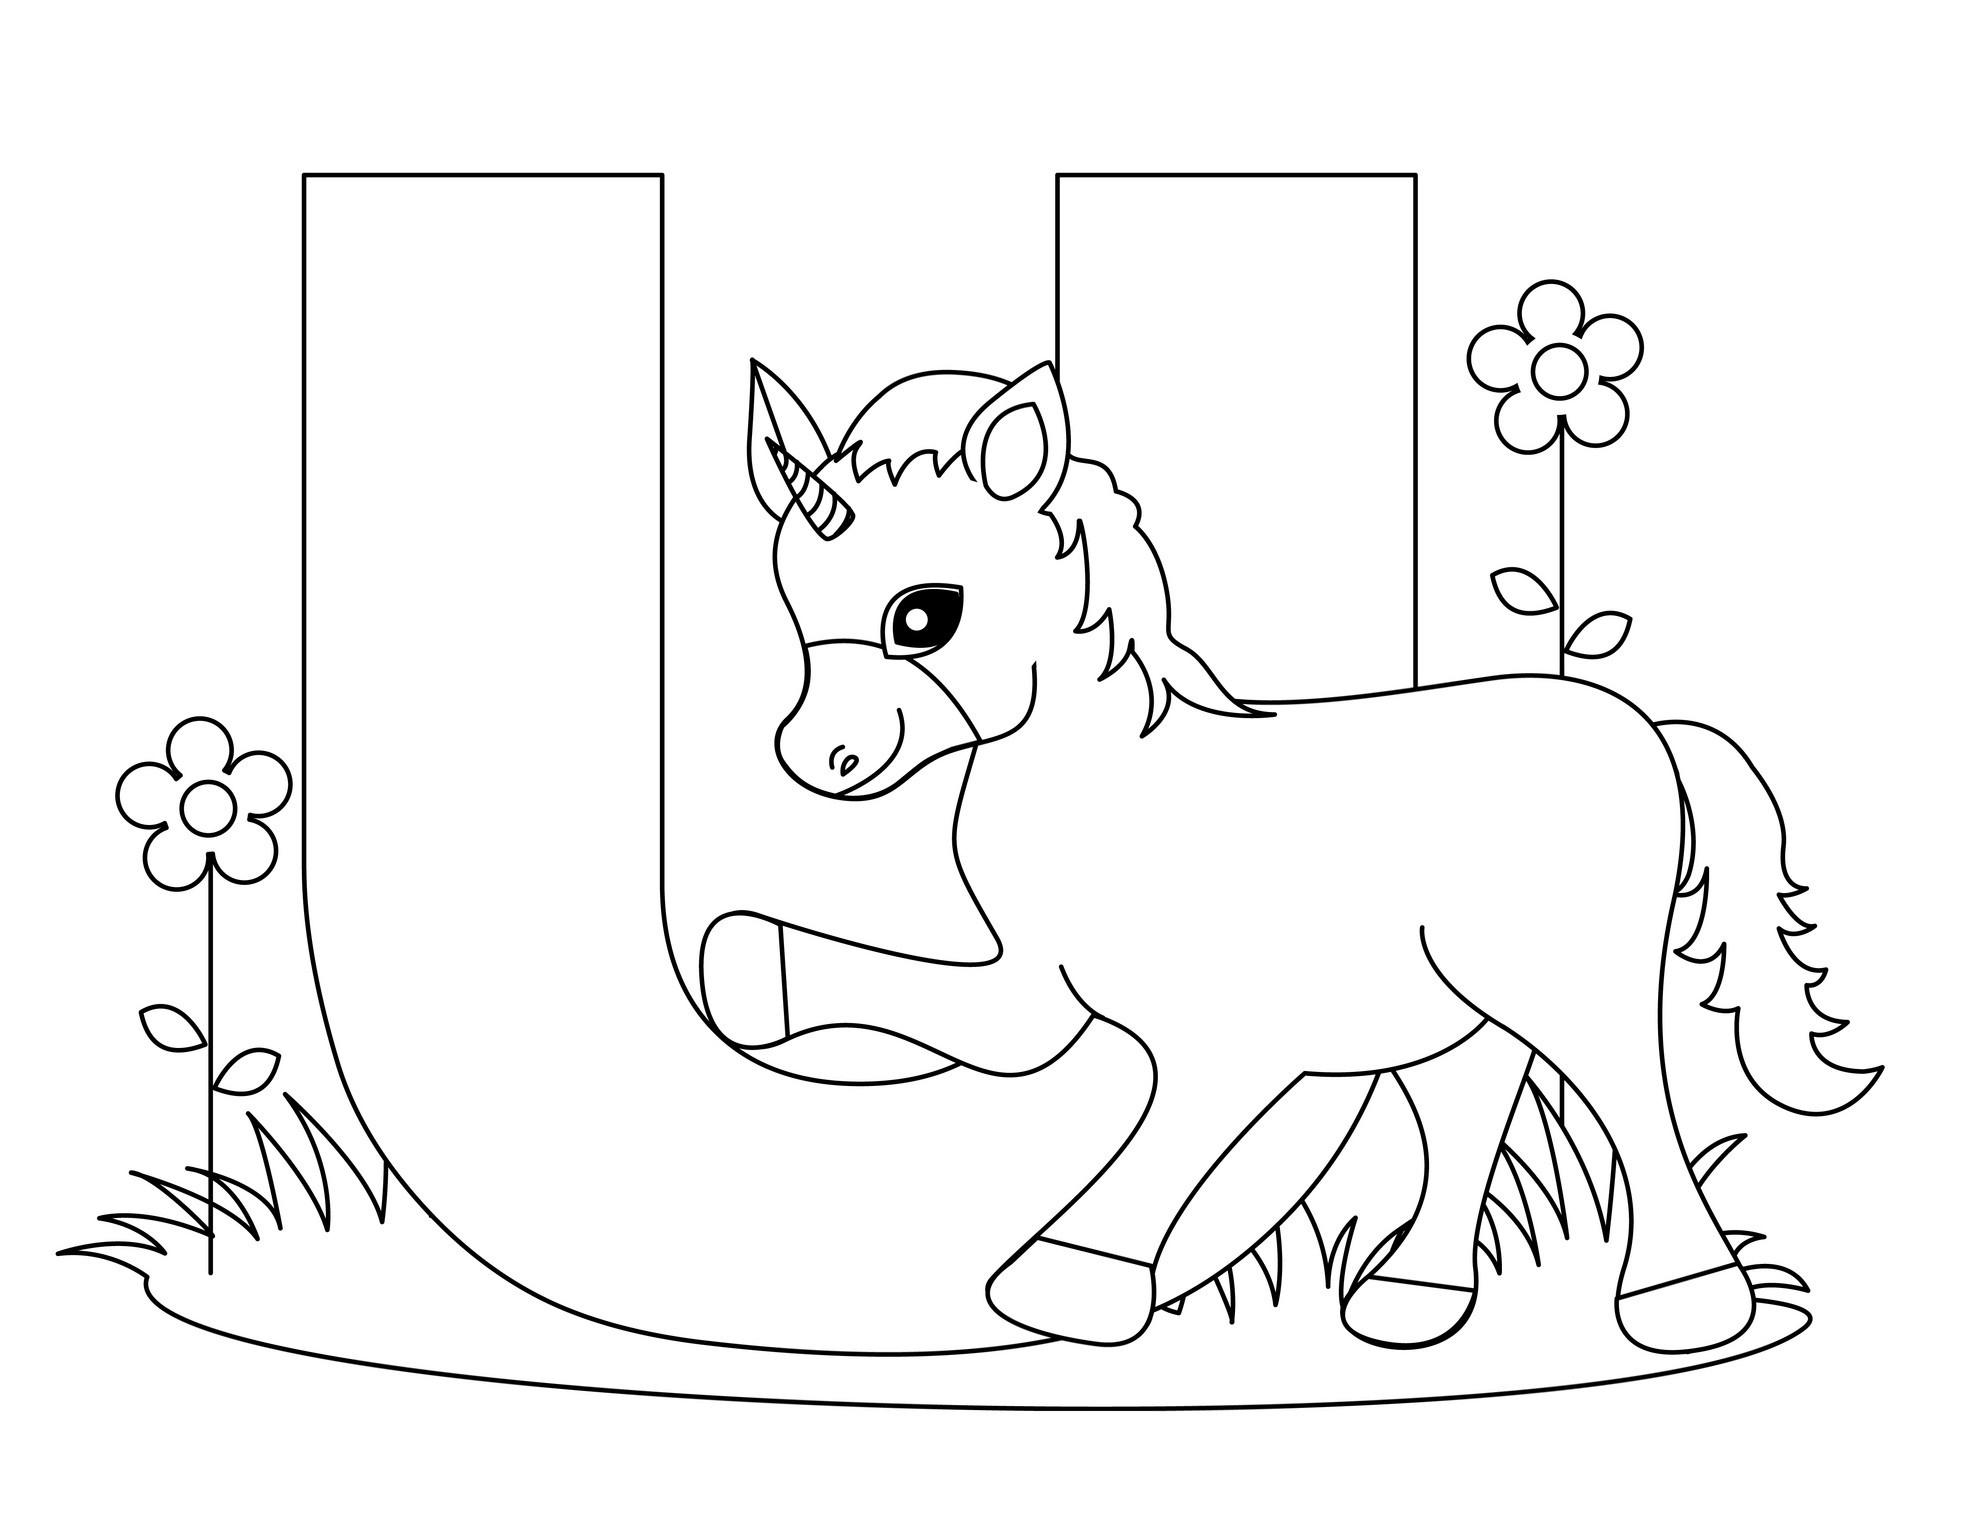 letter u colouring pages letter u coloring pages getcoloringpagescom letter colouring u pages